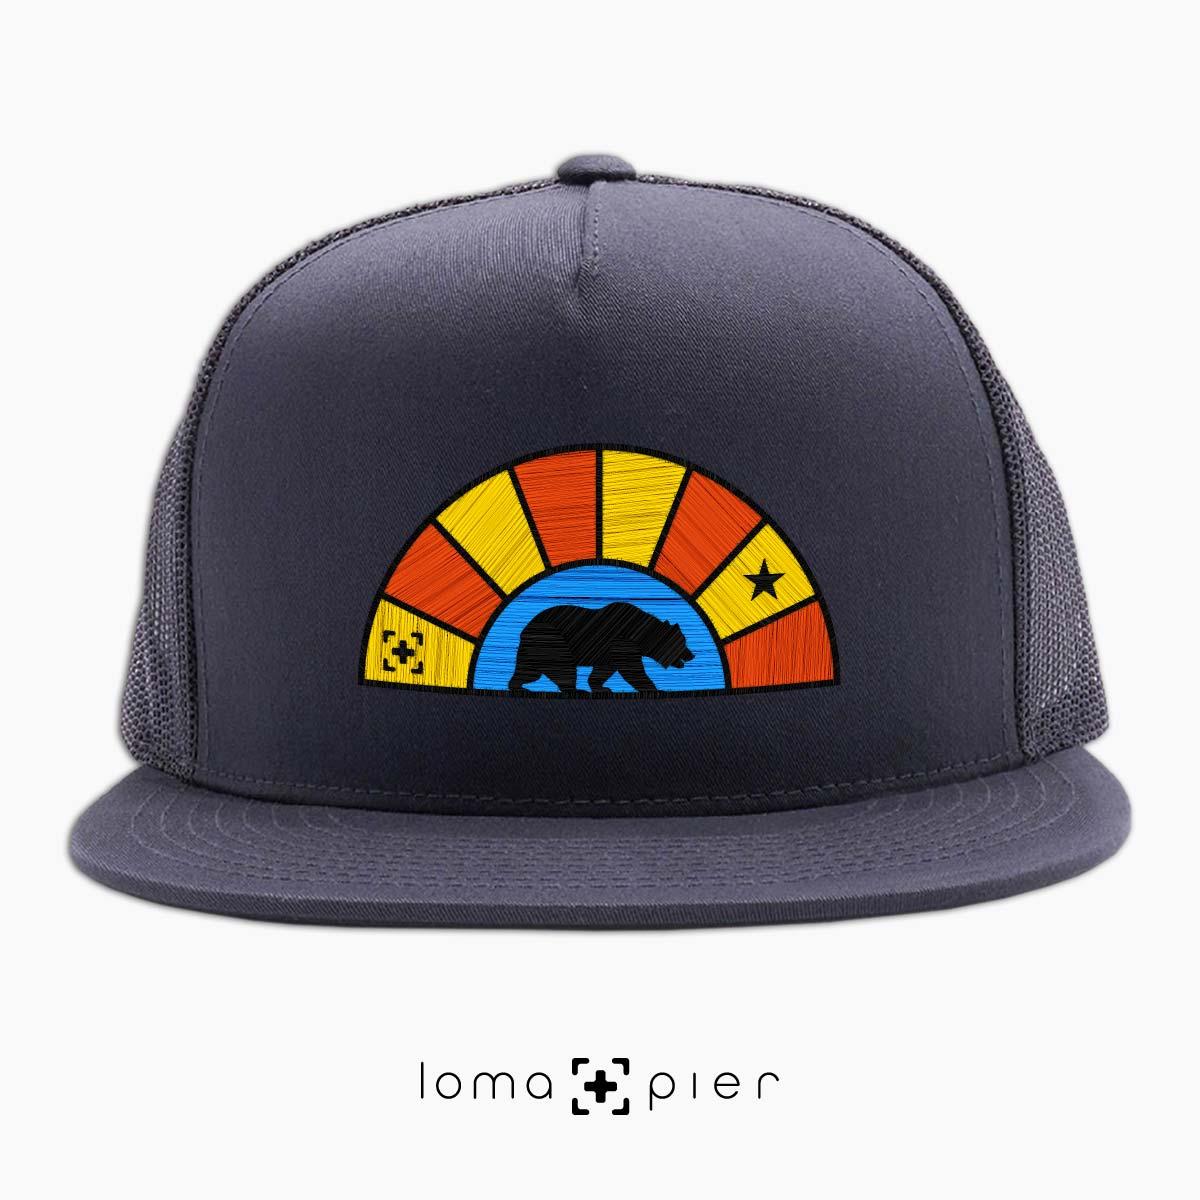 bear badge netback hat in charcoal by lomapier hat store